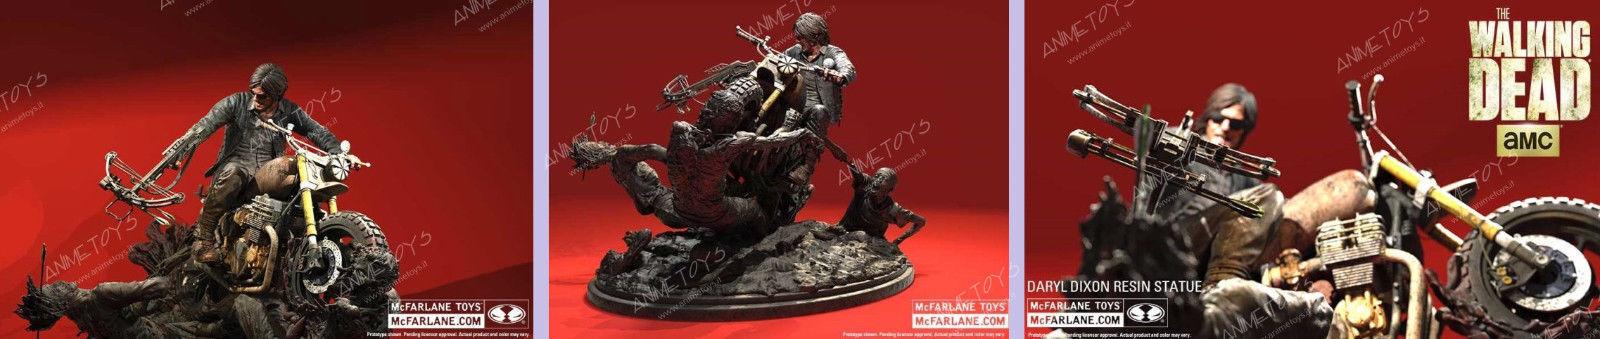 McFarlane THE WALKING DEAD – Daryl Dixon Limited Statue